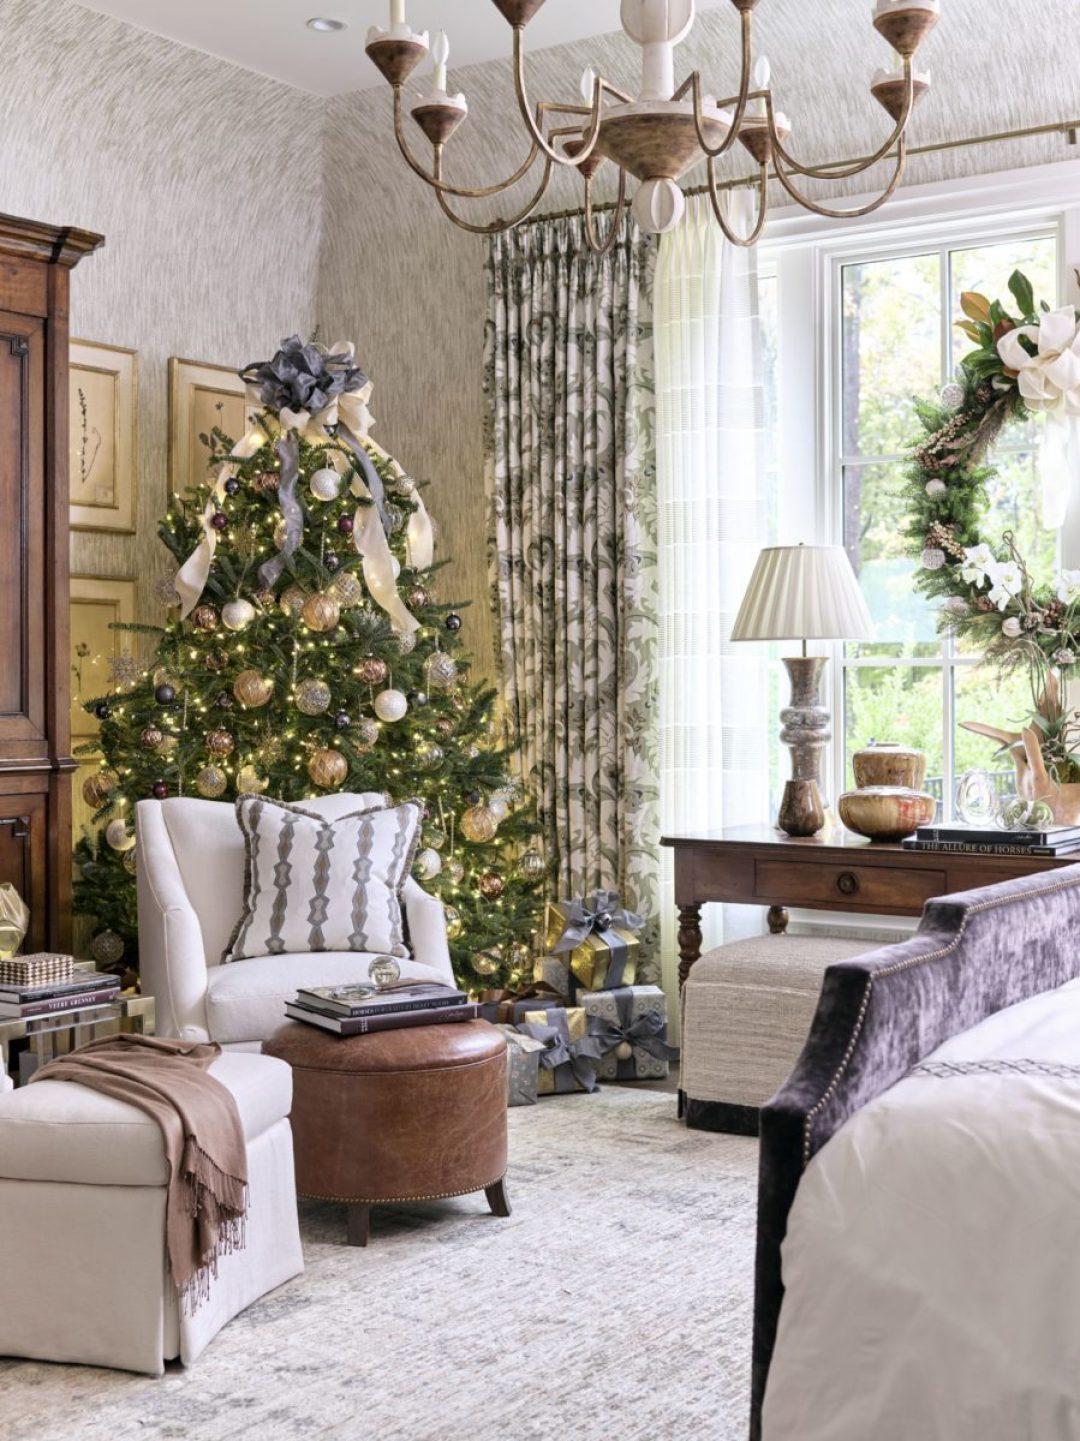 AHL_181113_showhouse32050_Jessica-Bradley Home for the Holidays 2018: Atlanta, GA Style